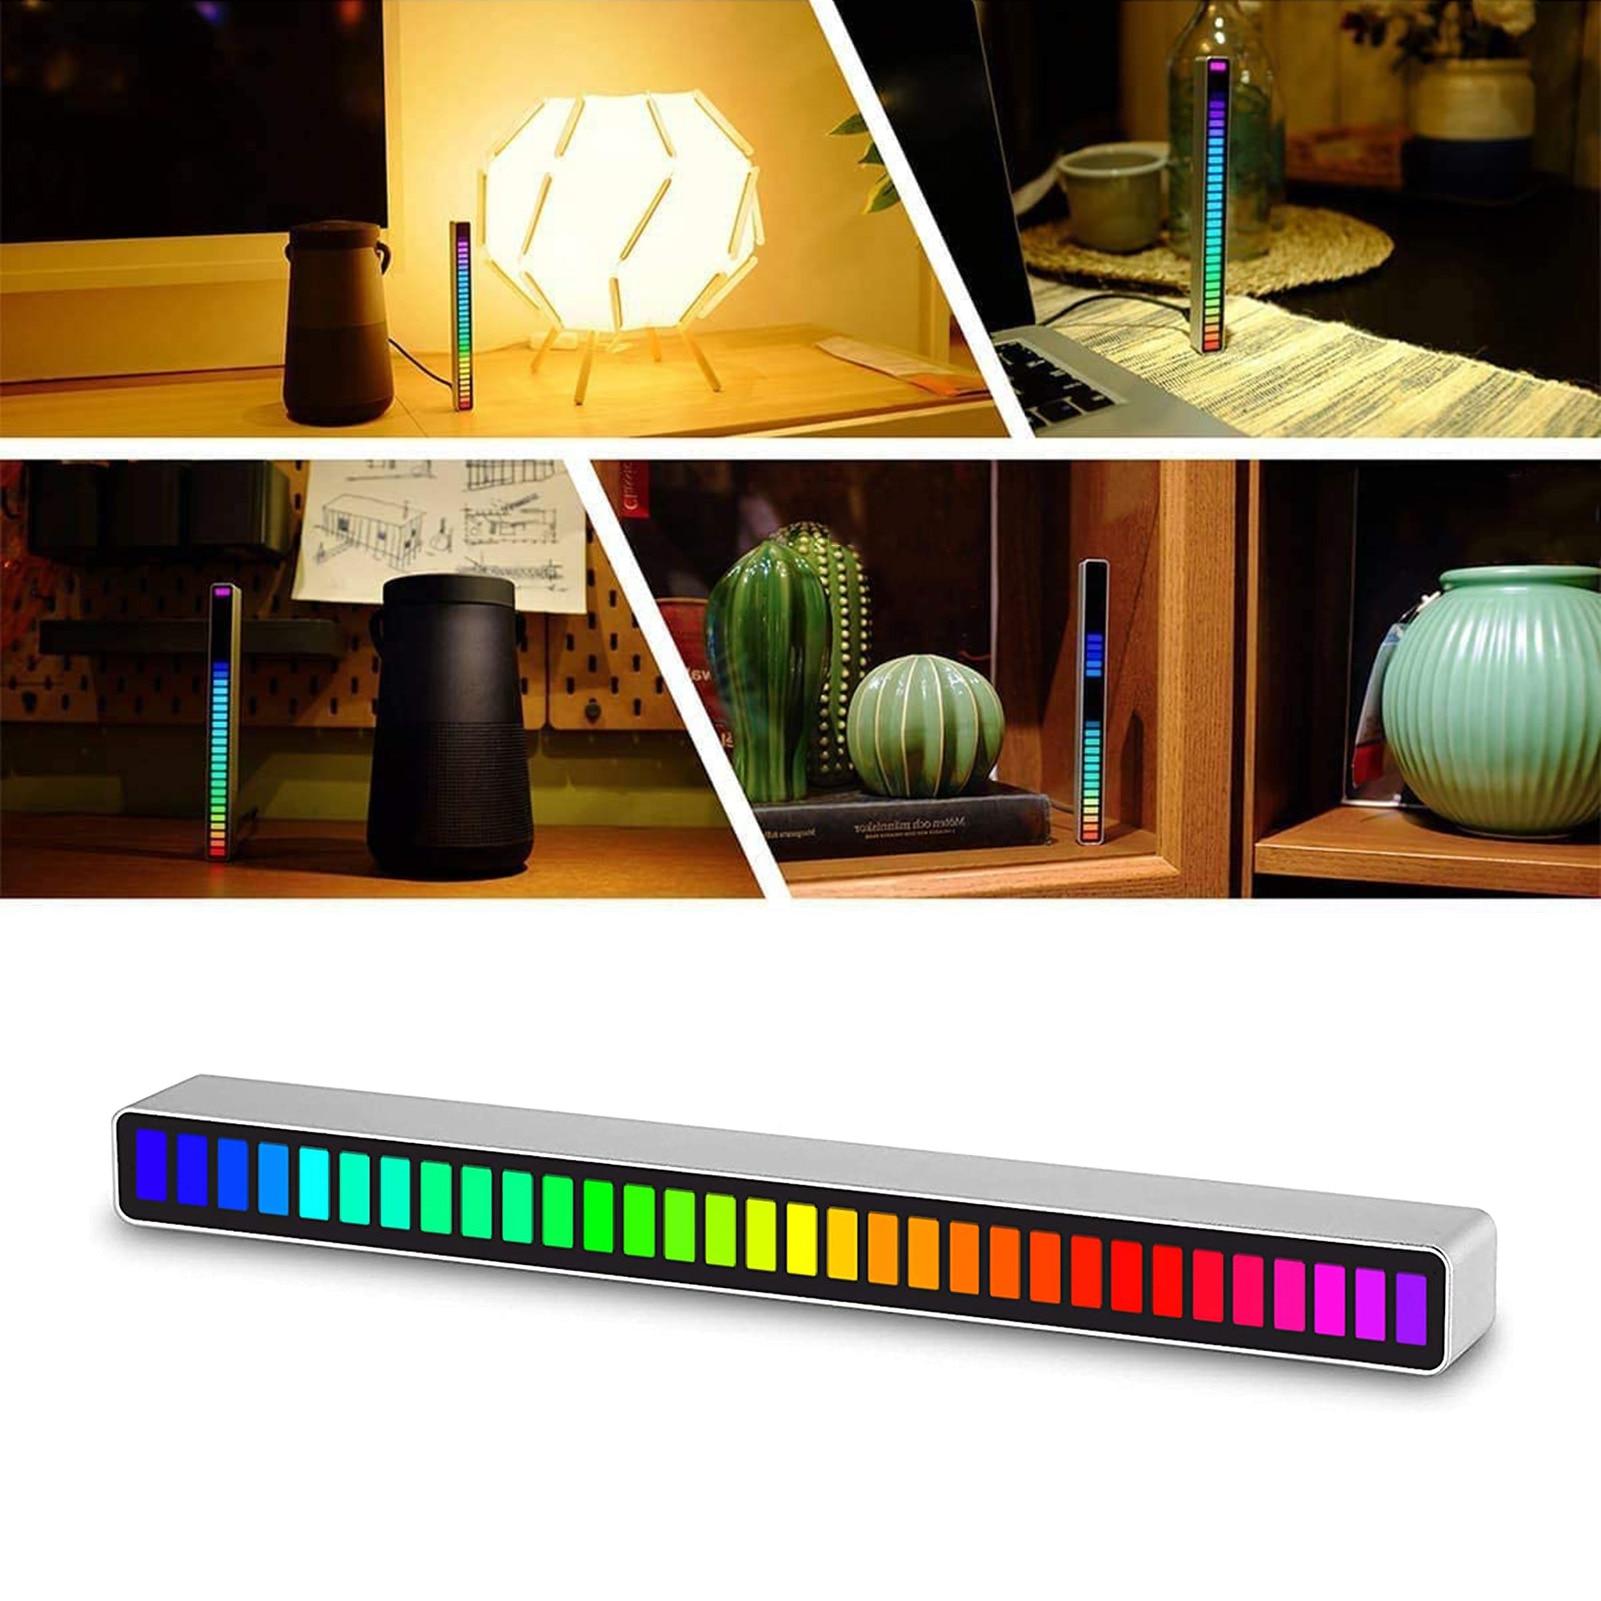 32 Bit Music Level Indicator Aluminum Bar Voice Sound Control Audio Spectrum RGB Light LED Display Rhythm Pulse Colorful Signal